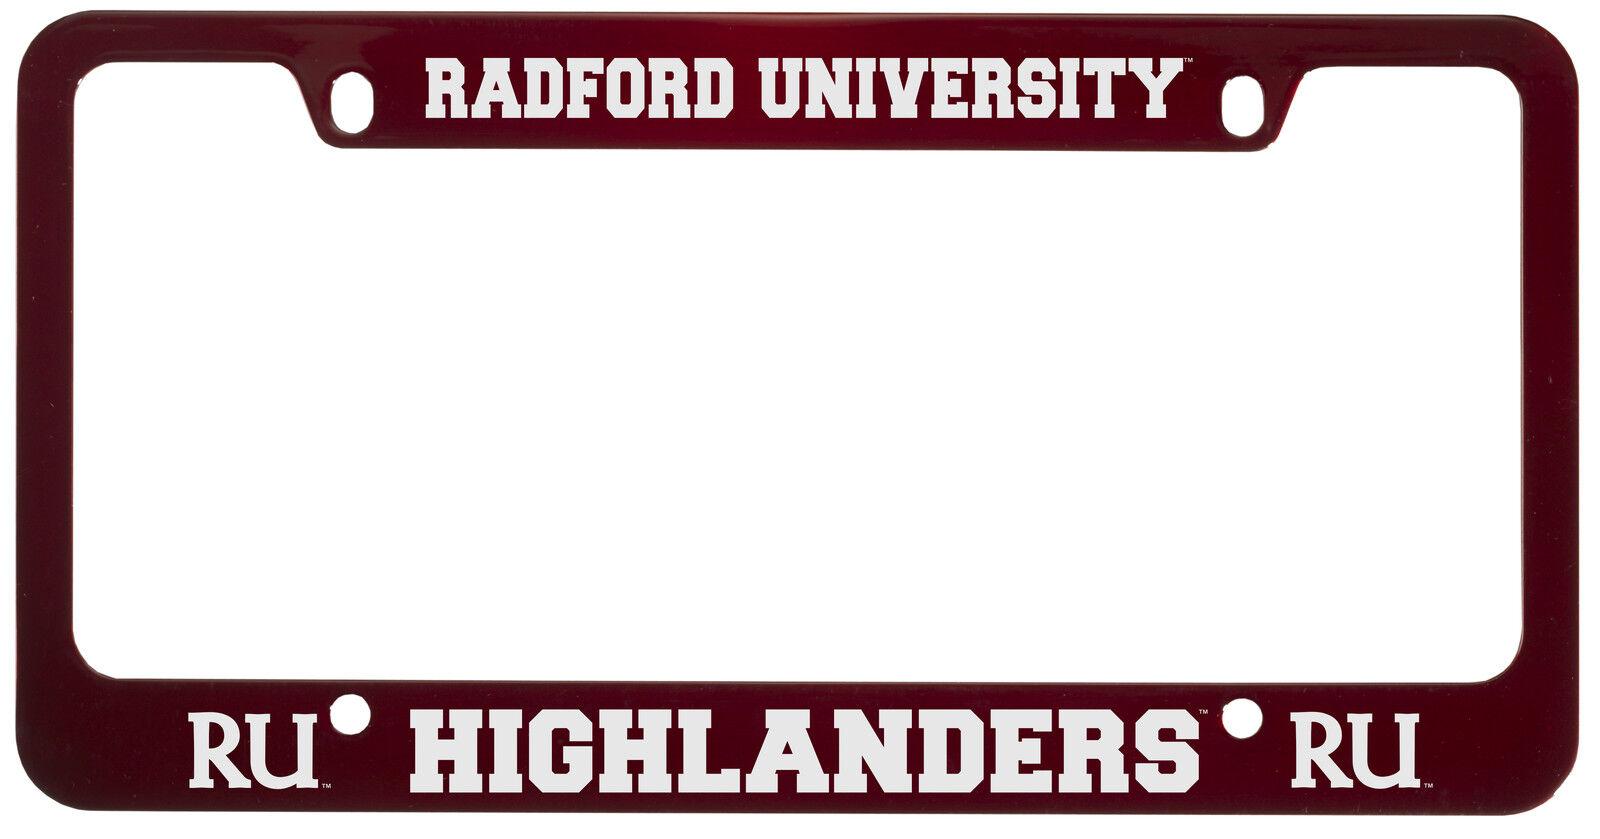 Radford University -metal License Plate Frame-red | eBay